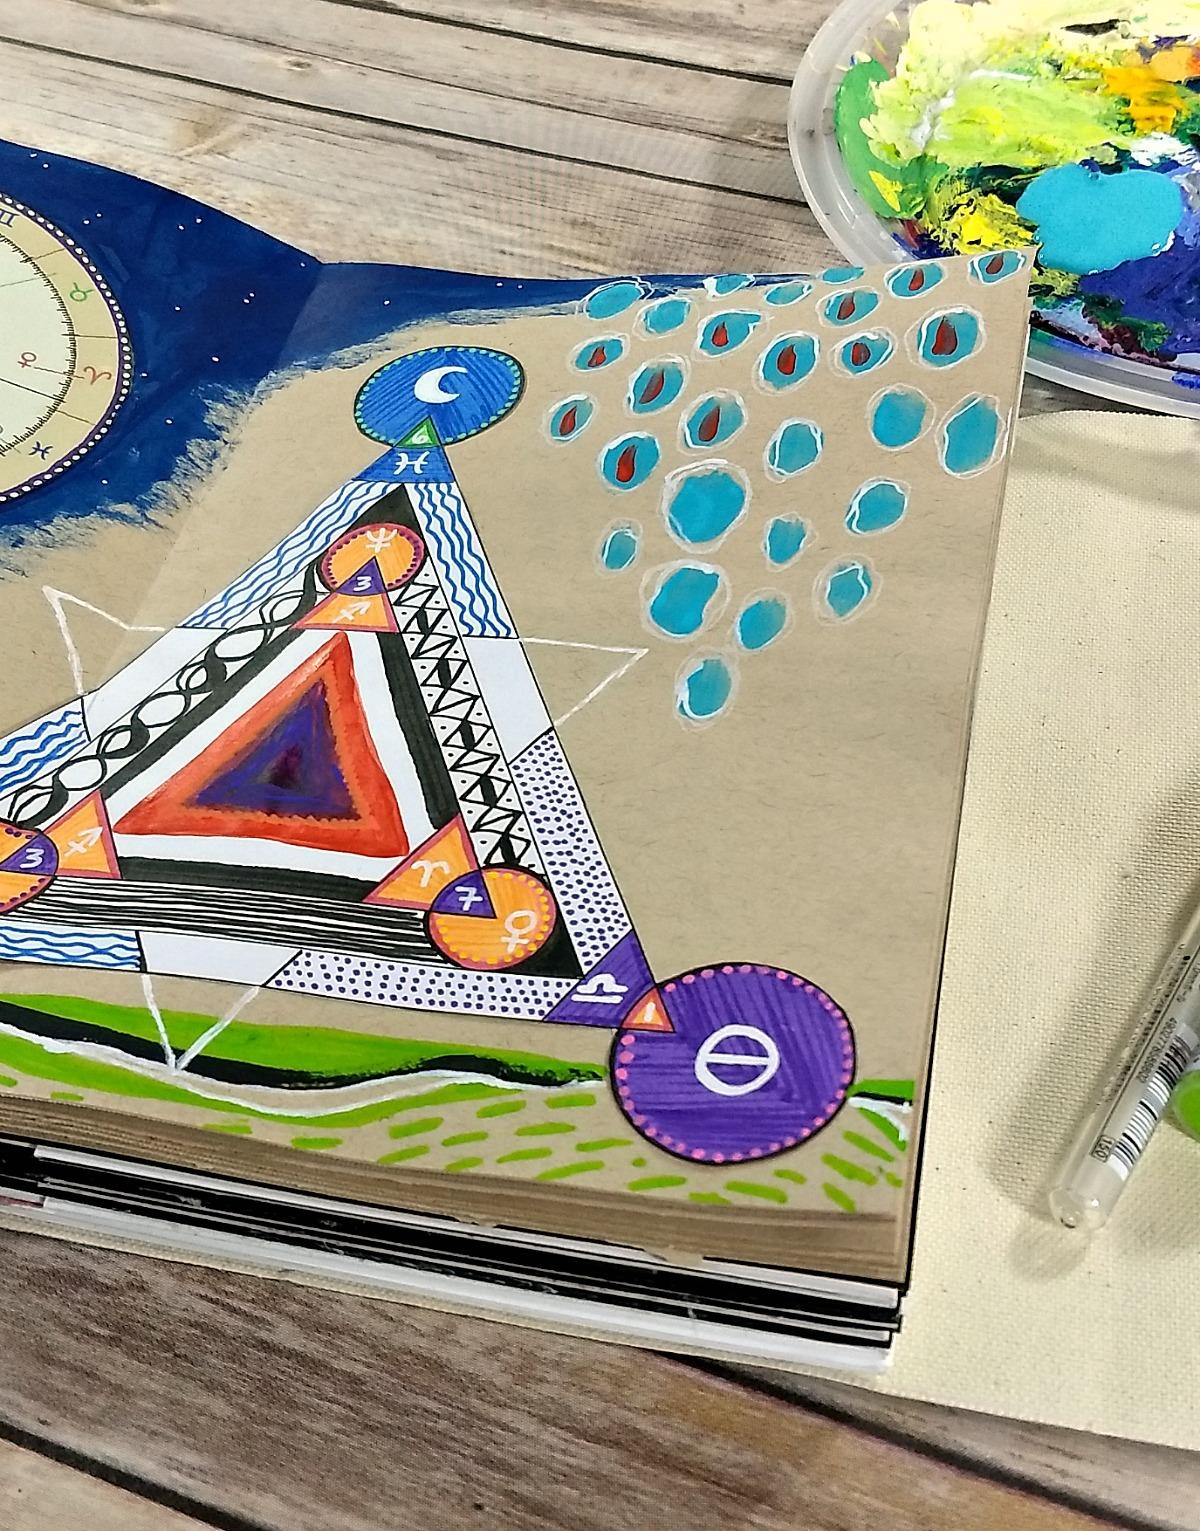 astrology + creative practice in my art journal